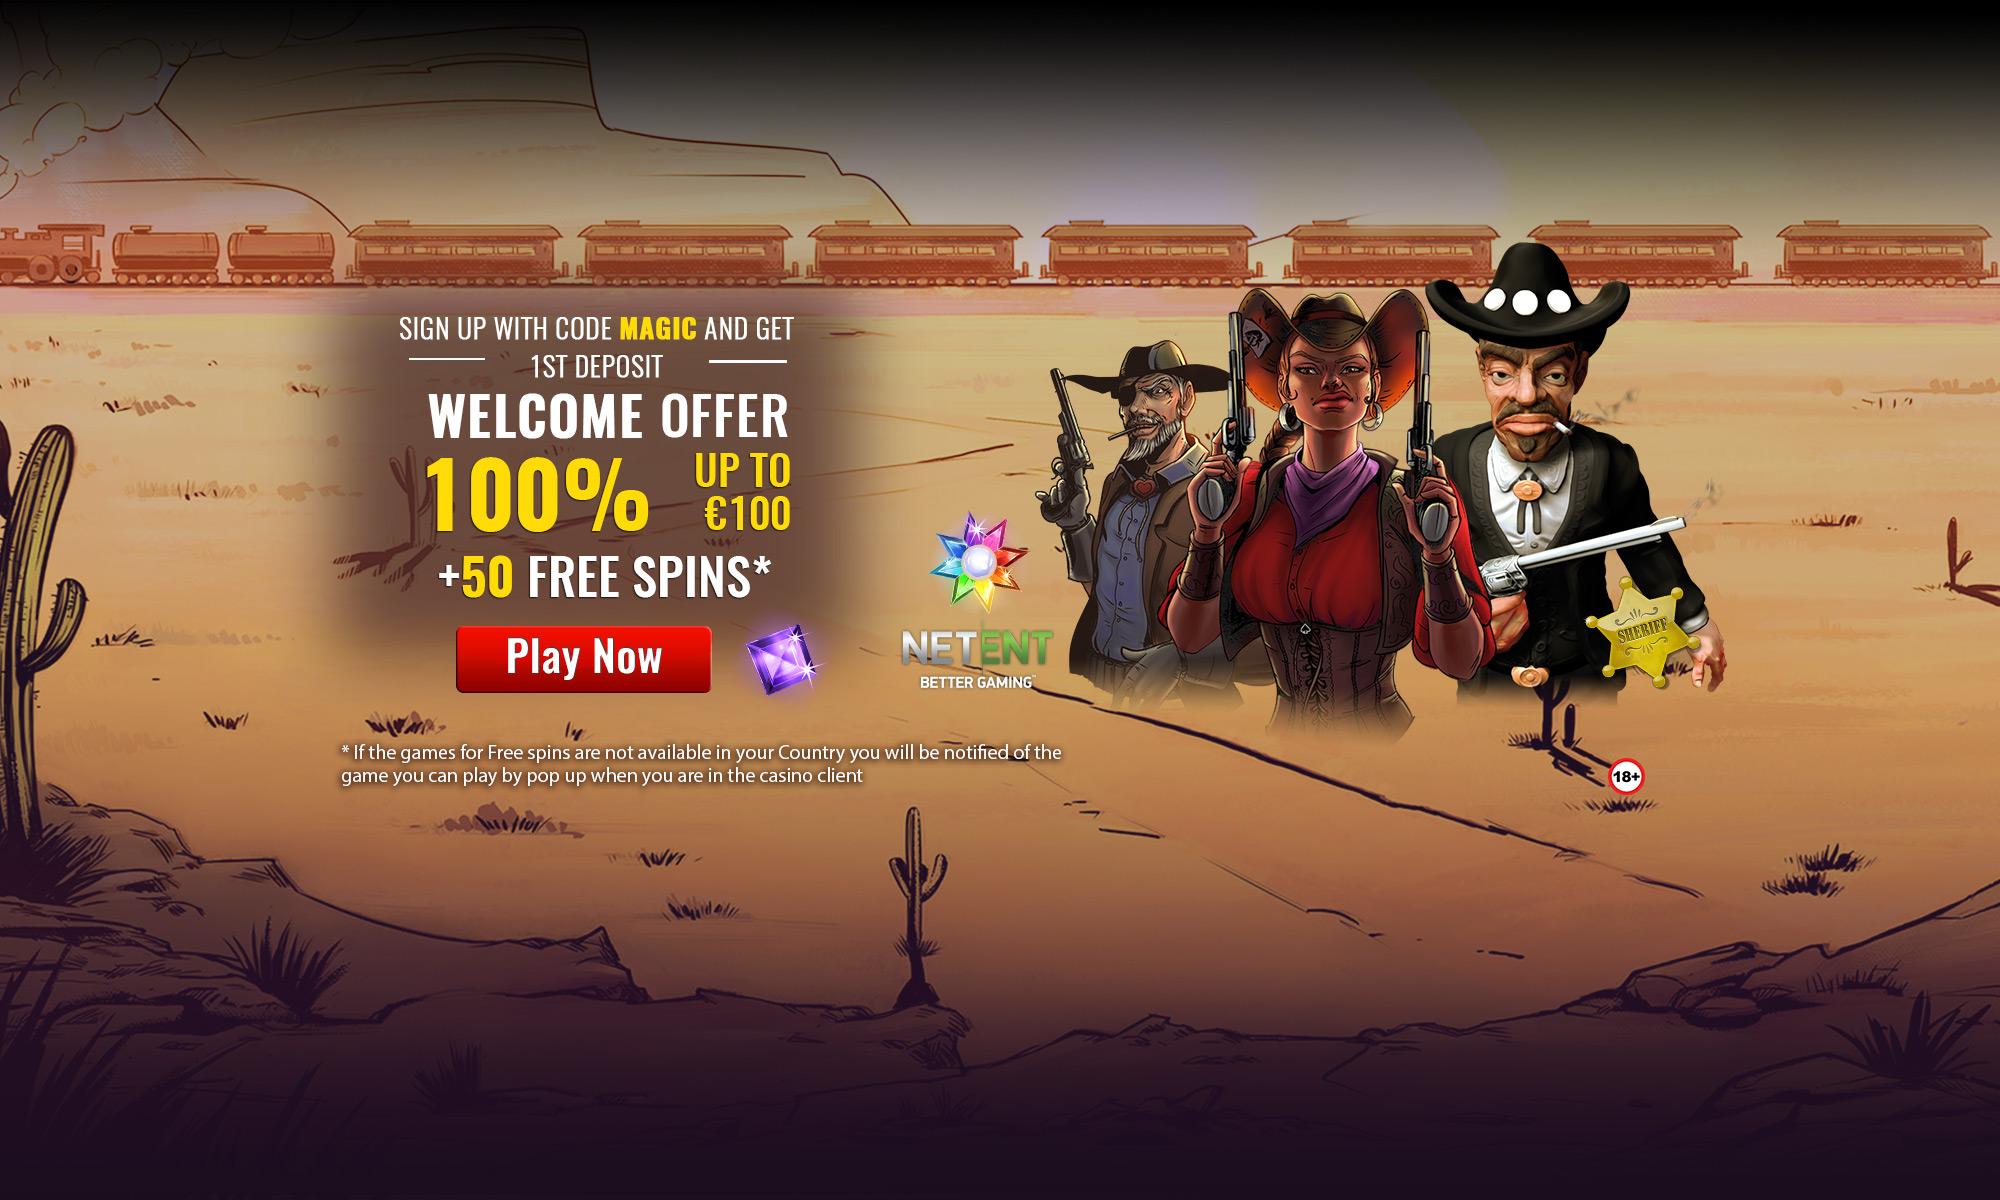 Cats eye casino no deposit bonus codes june 2011 casino download free slot